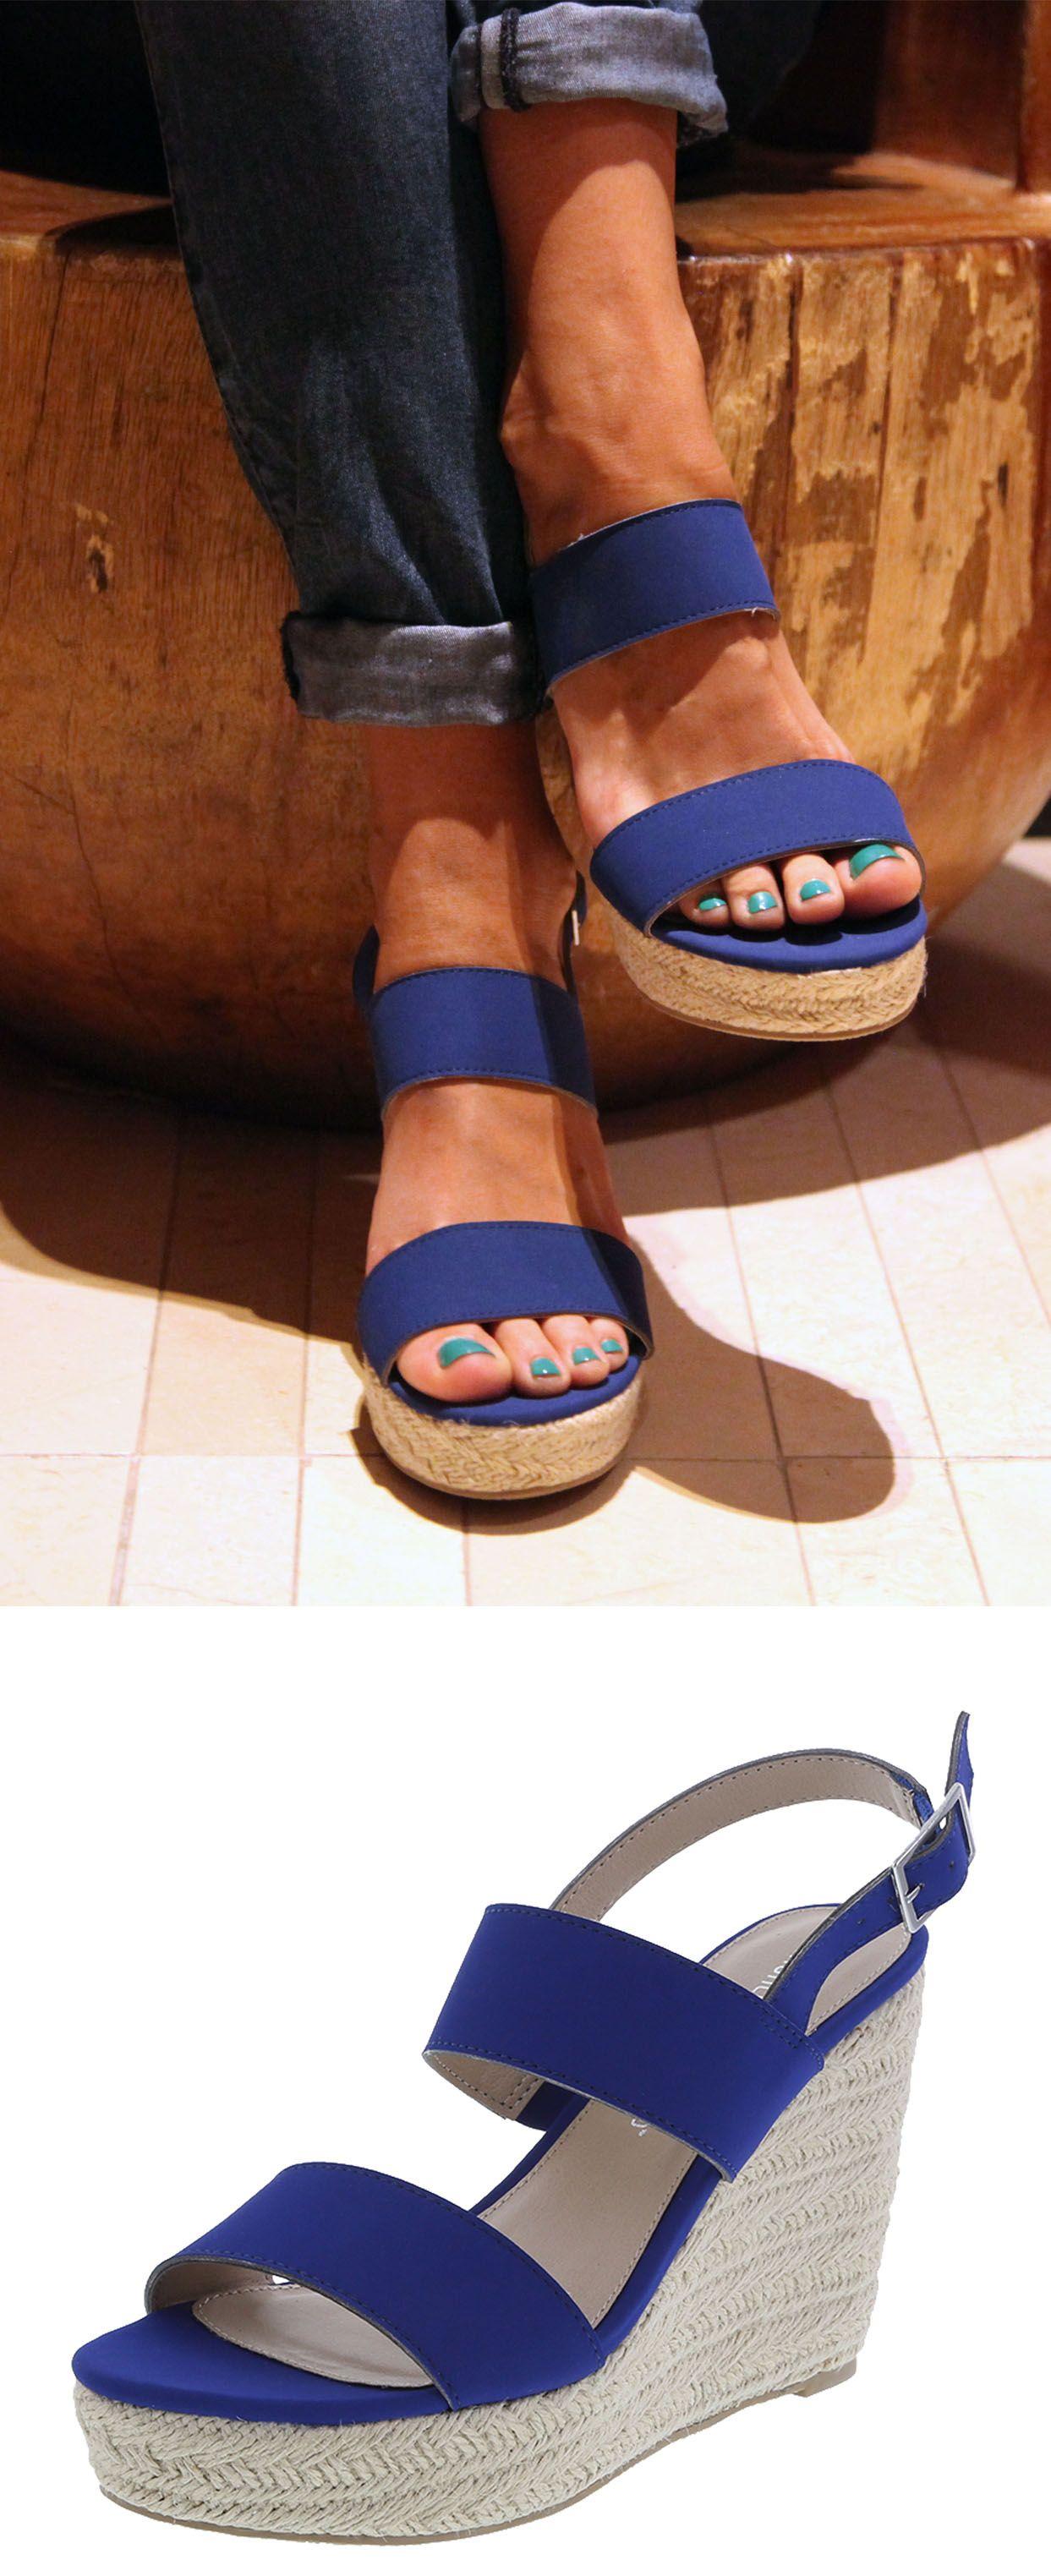 da18b575561fe Whimsy Espadrille Wedge   Blue High Wedge Sandal   Payless ShoeSource